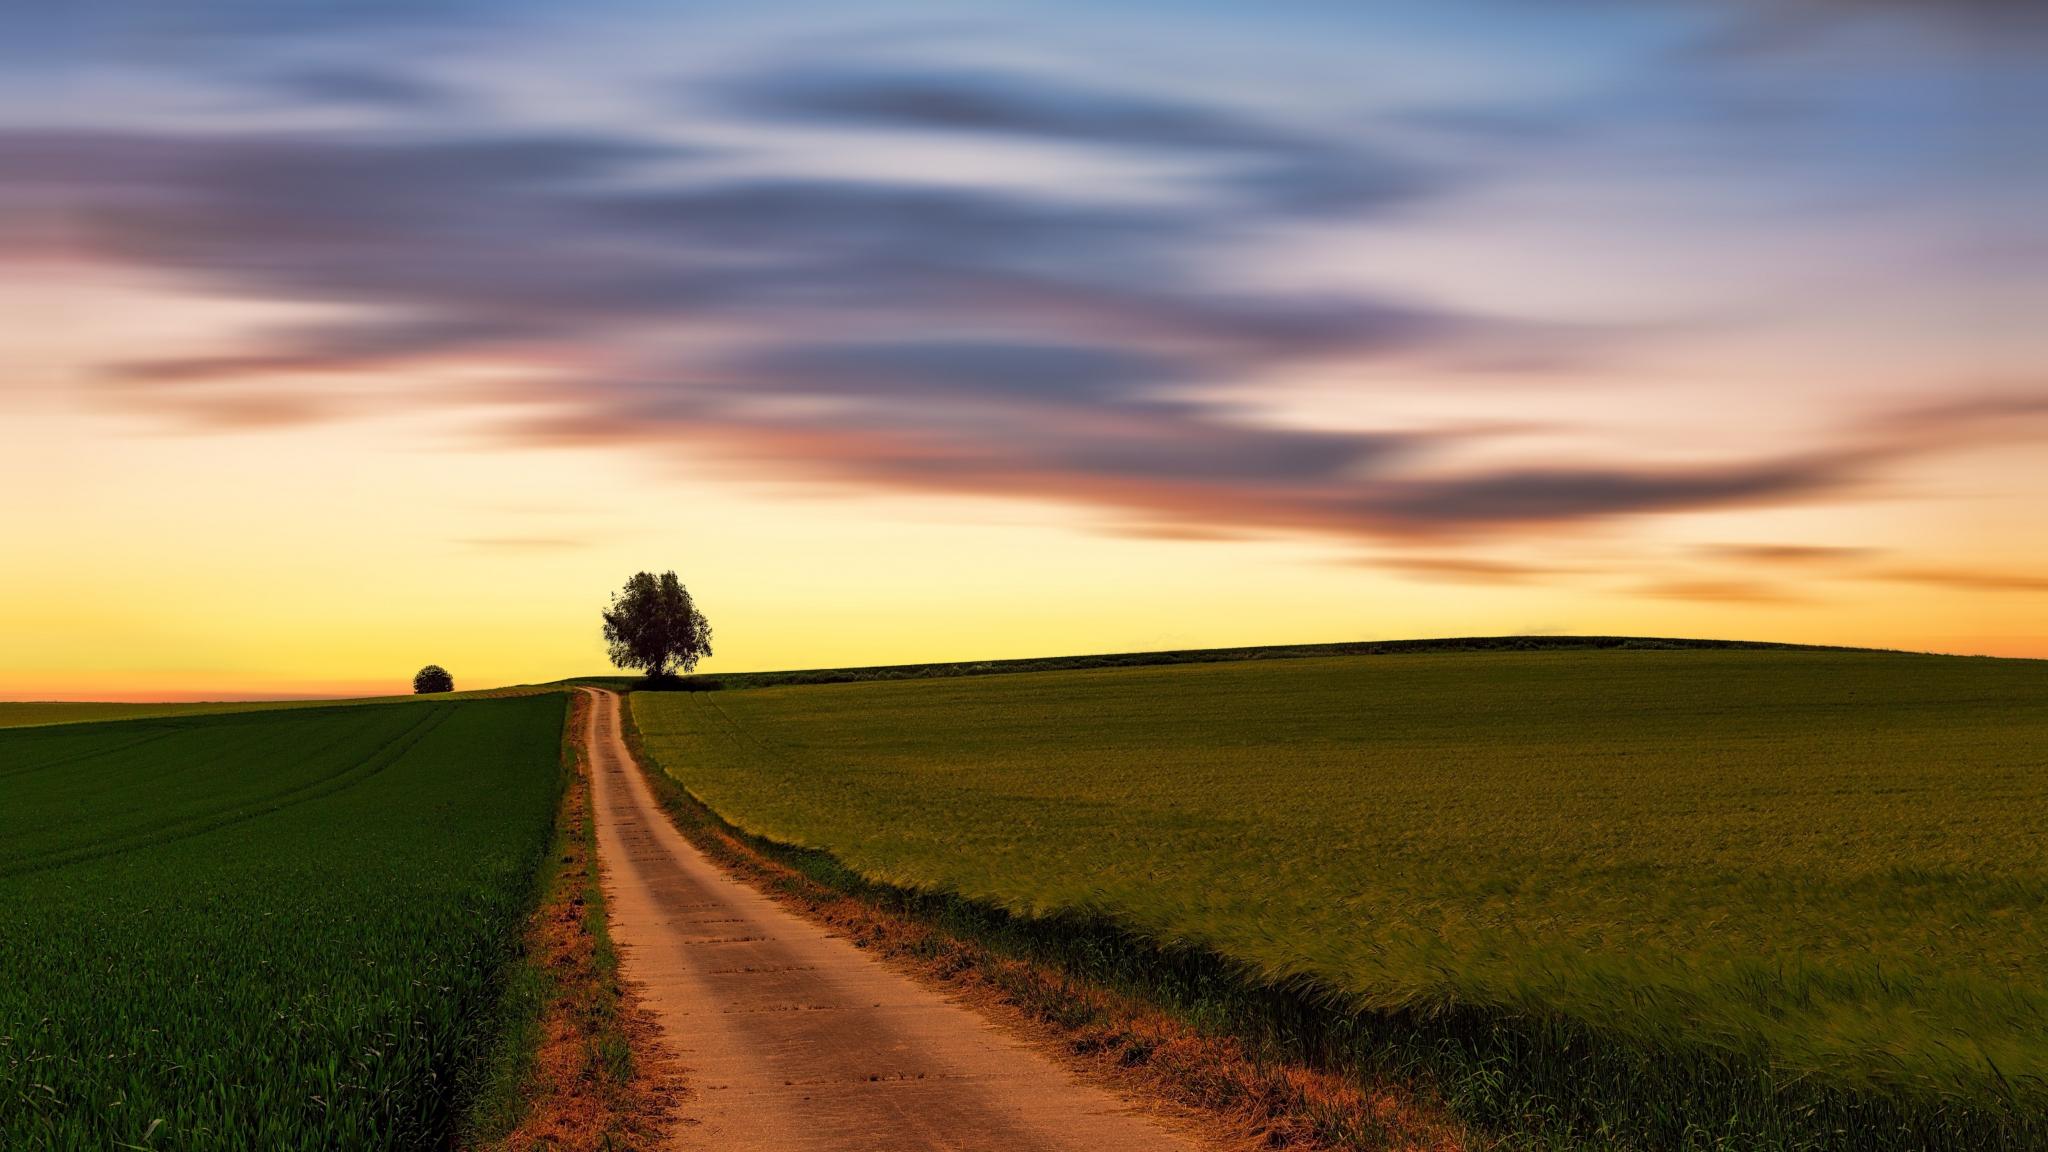 Sunset Skyline Clean Sky Wheat Farm Landscape 2048x1152 Wallpaper